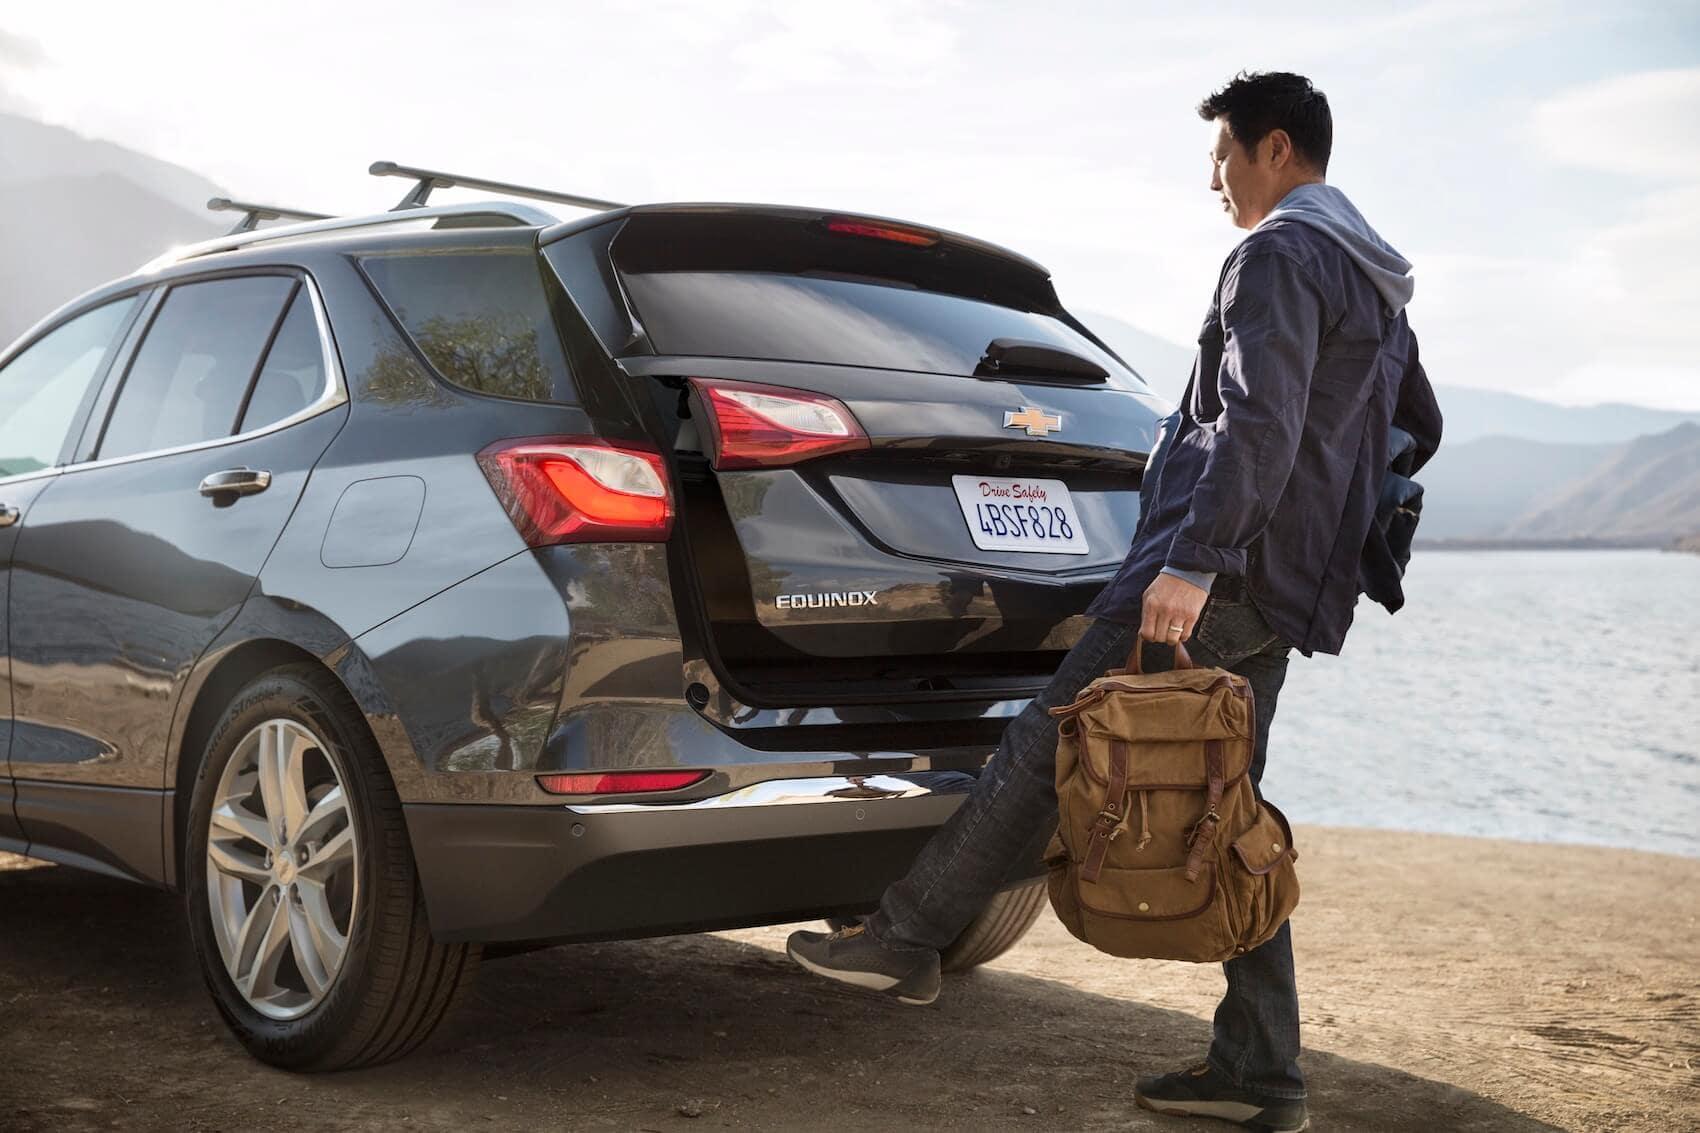 Chevy Equinox NHTSA Safety